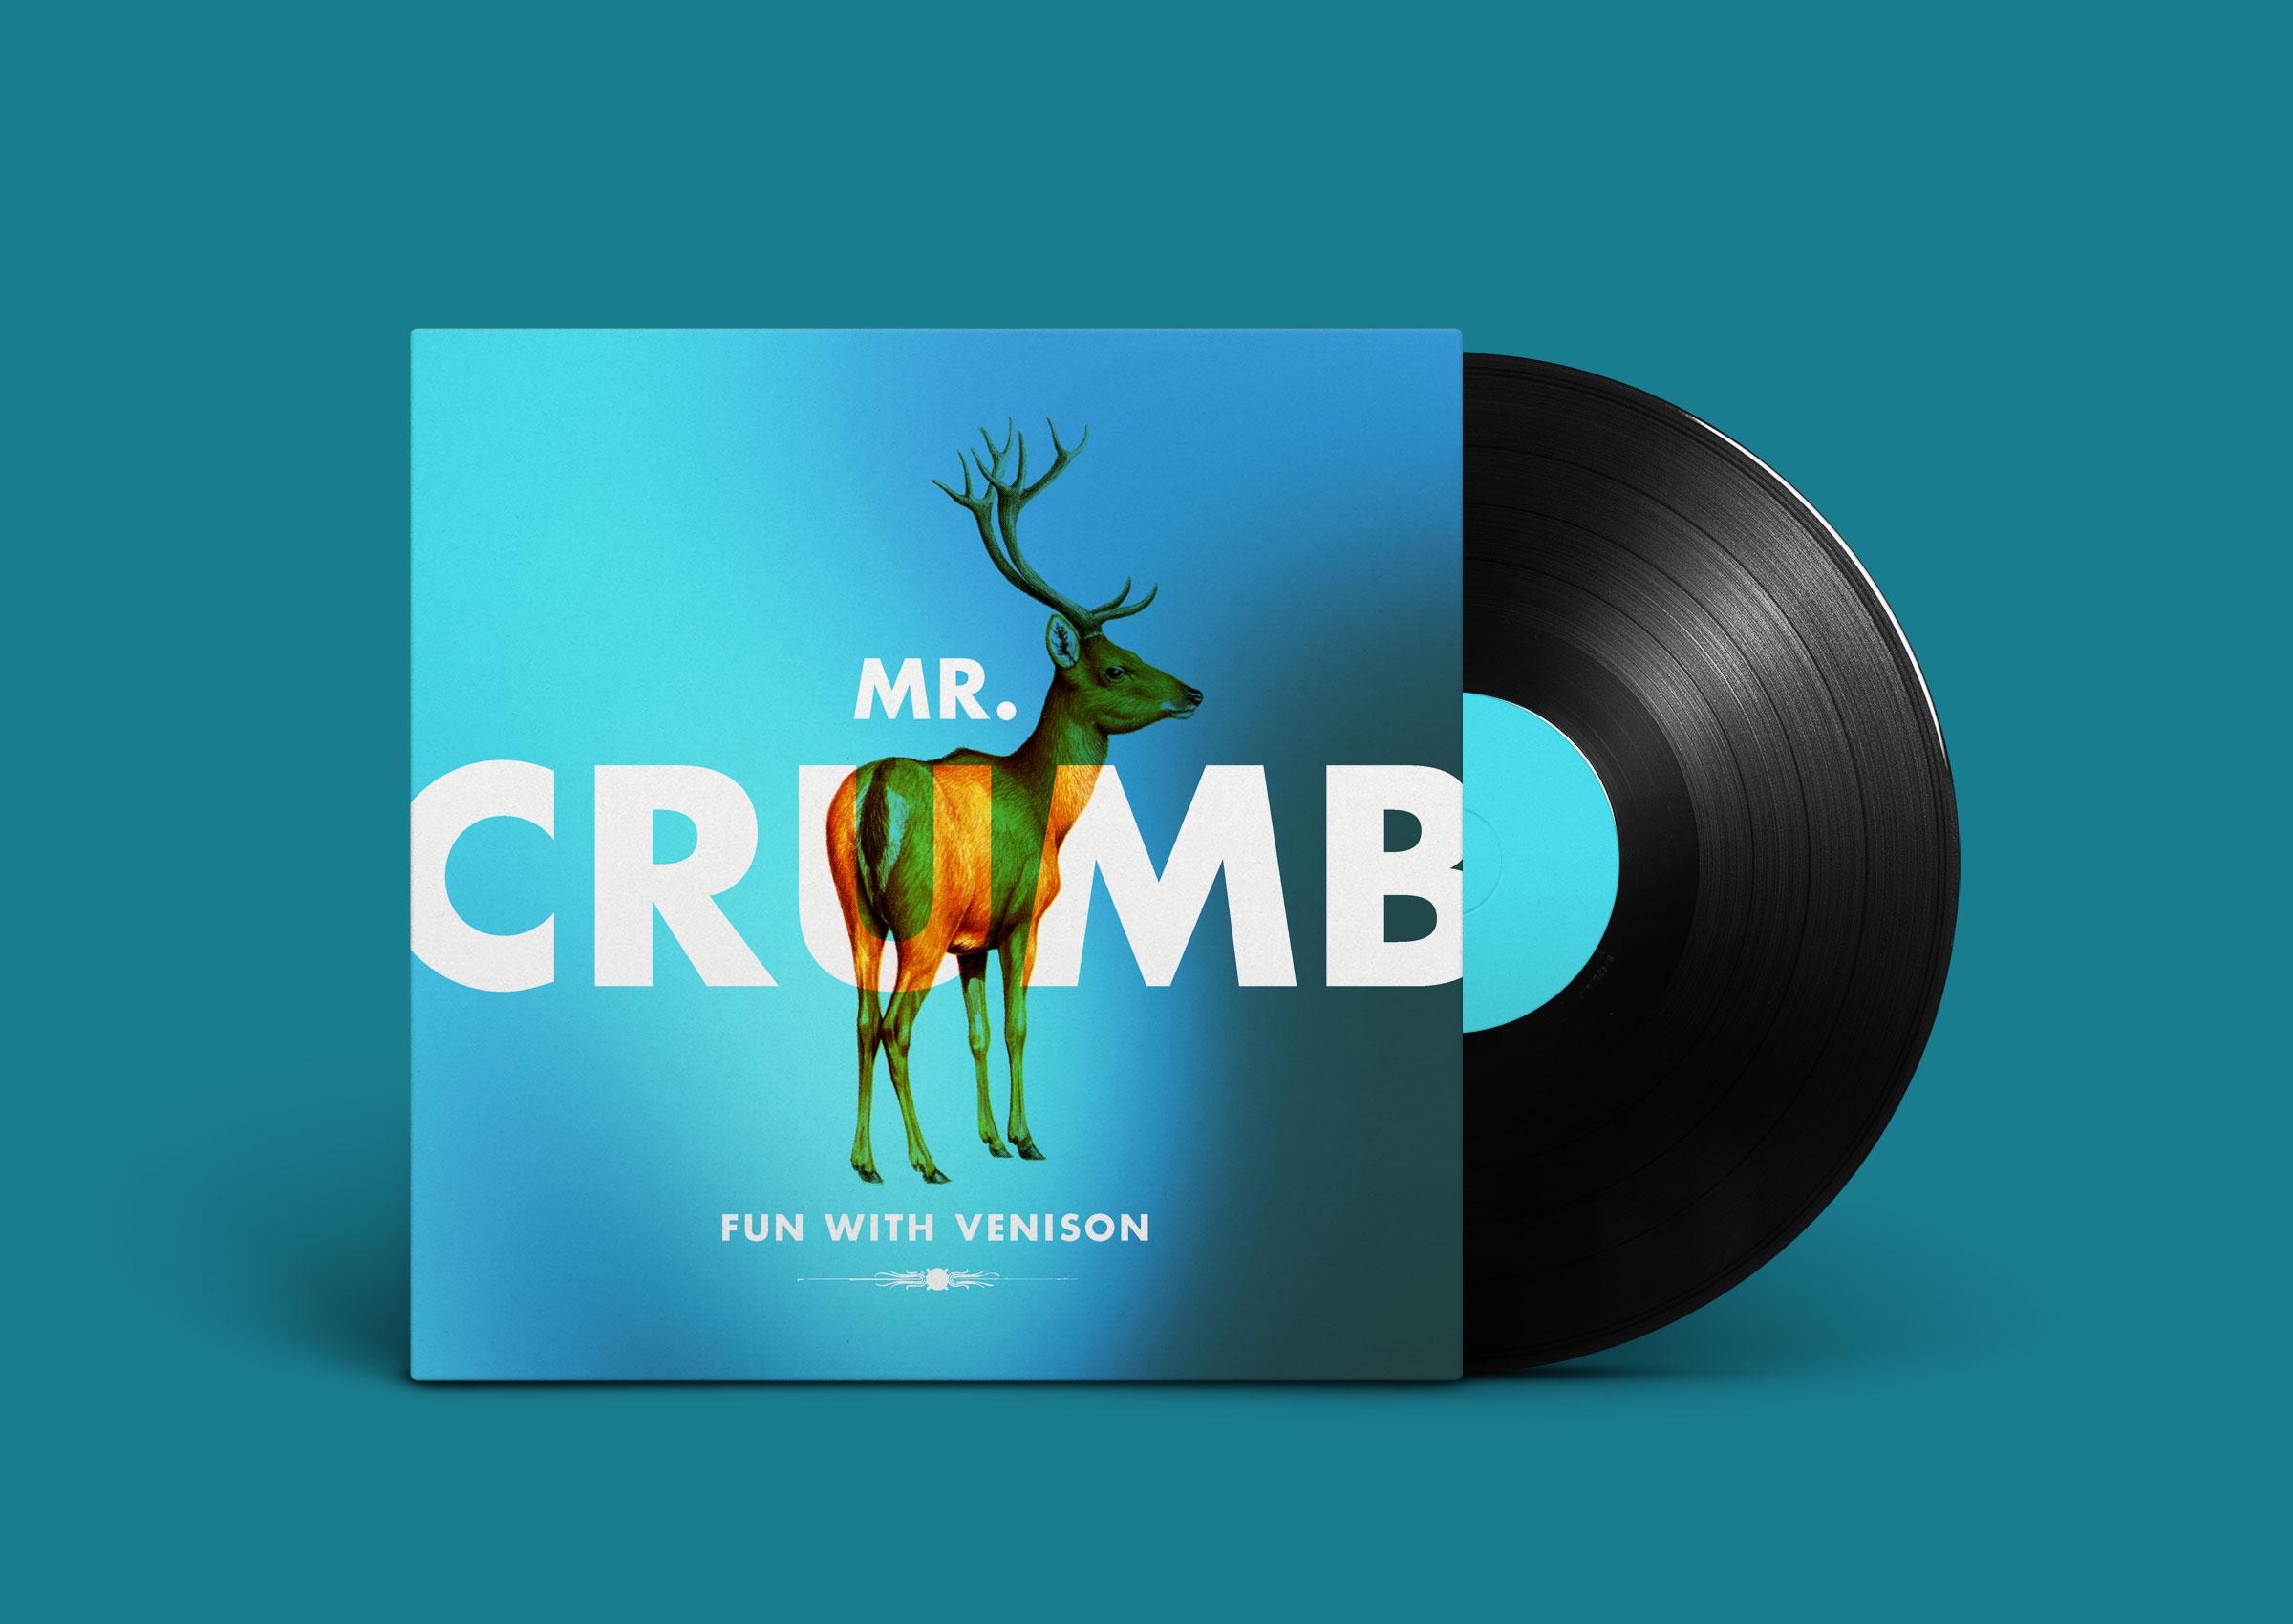 Vinyl-Record-PSD-MockUp-Crumb01.jpg